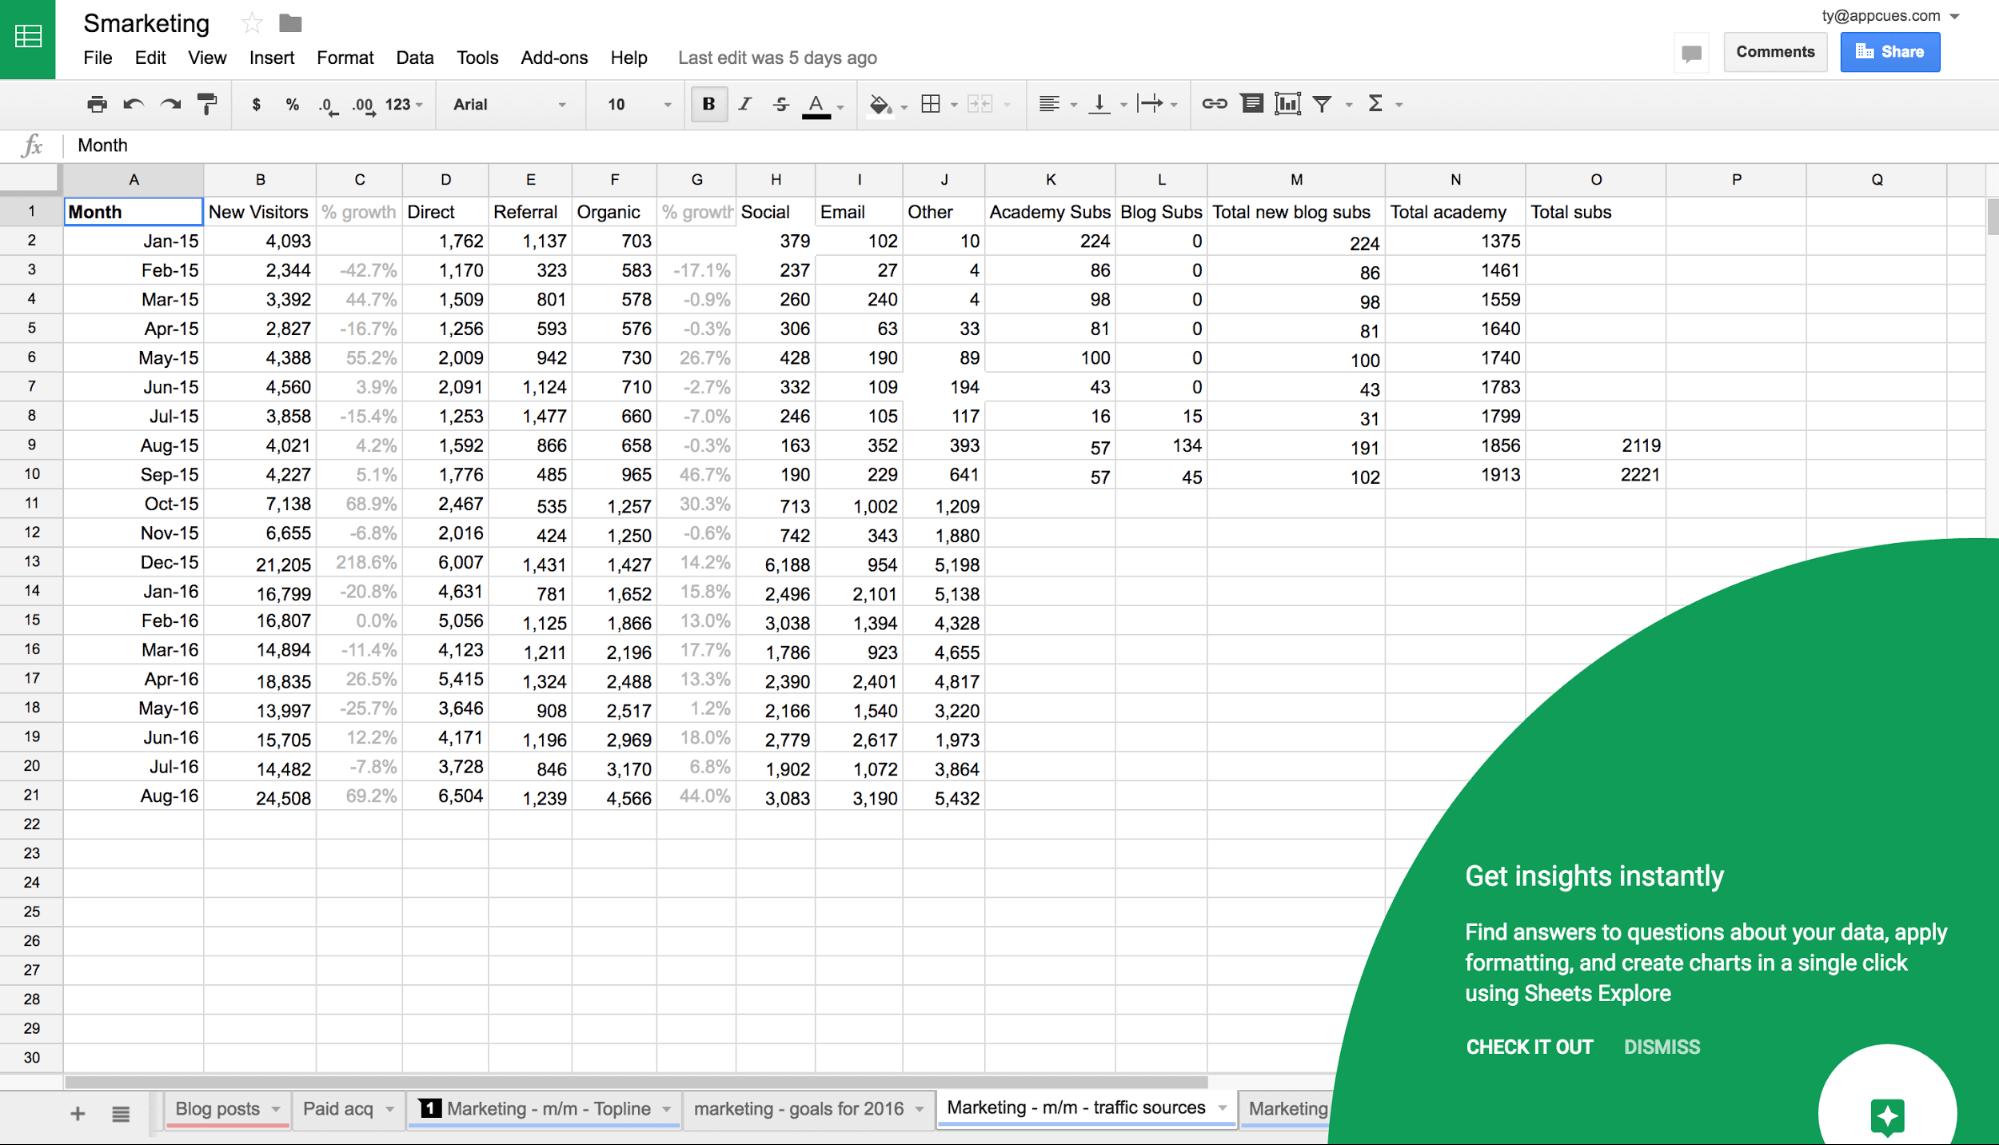 Smarketing spreadsheet